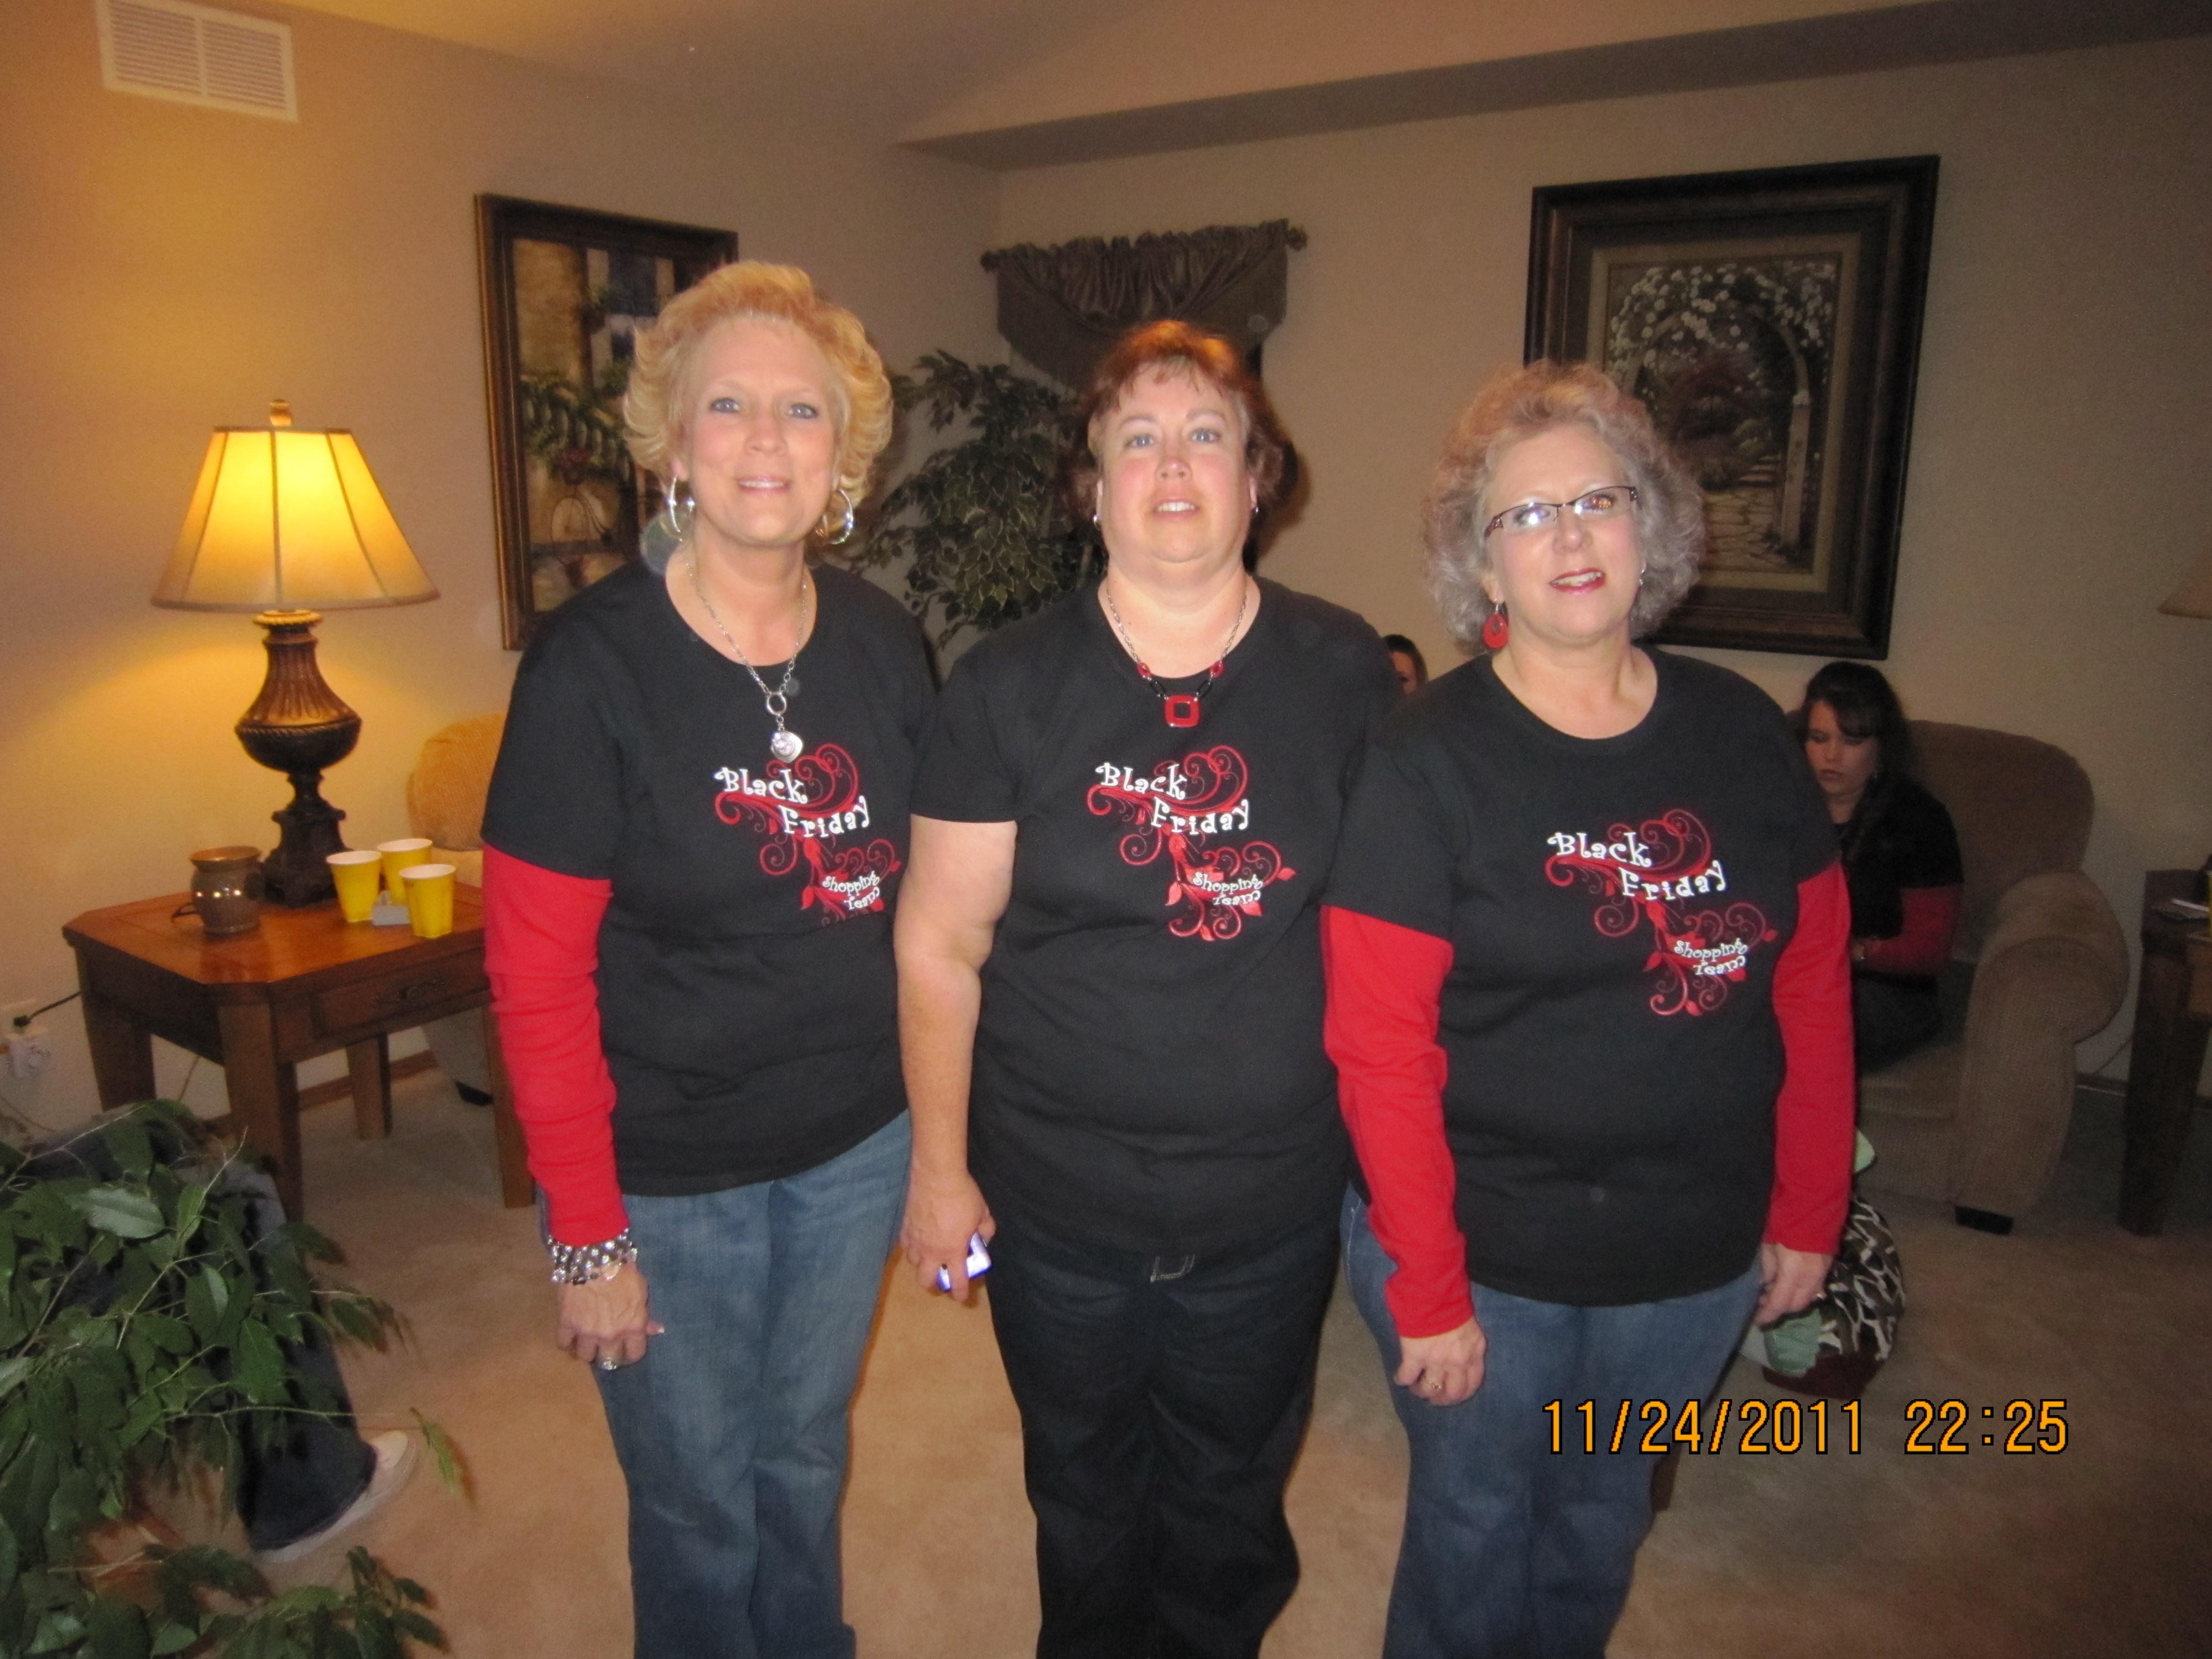 Black t shirt custom - Black Friday Shopping Team T Shirt Photo